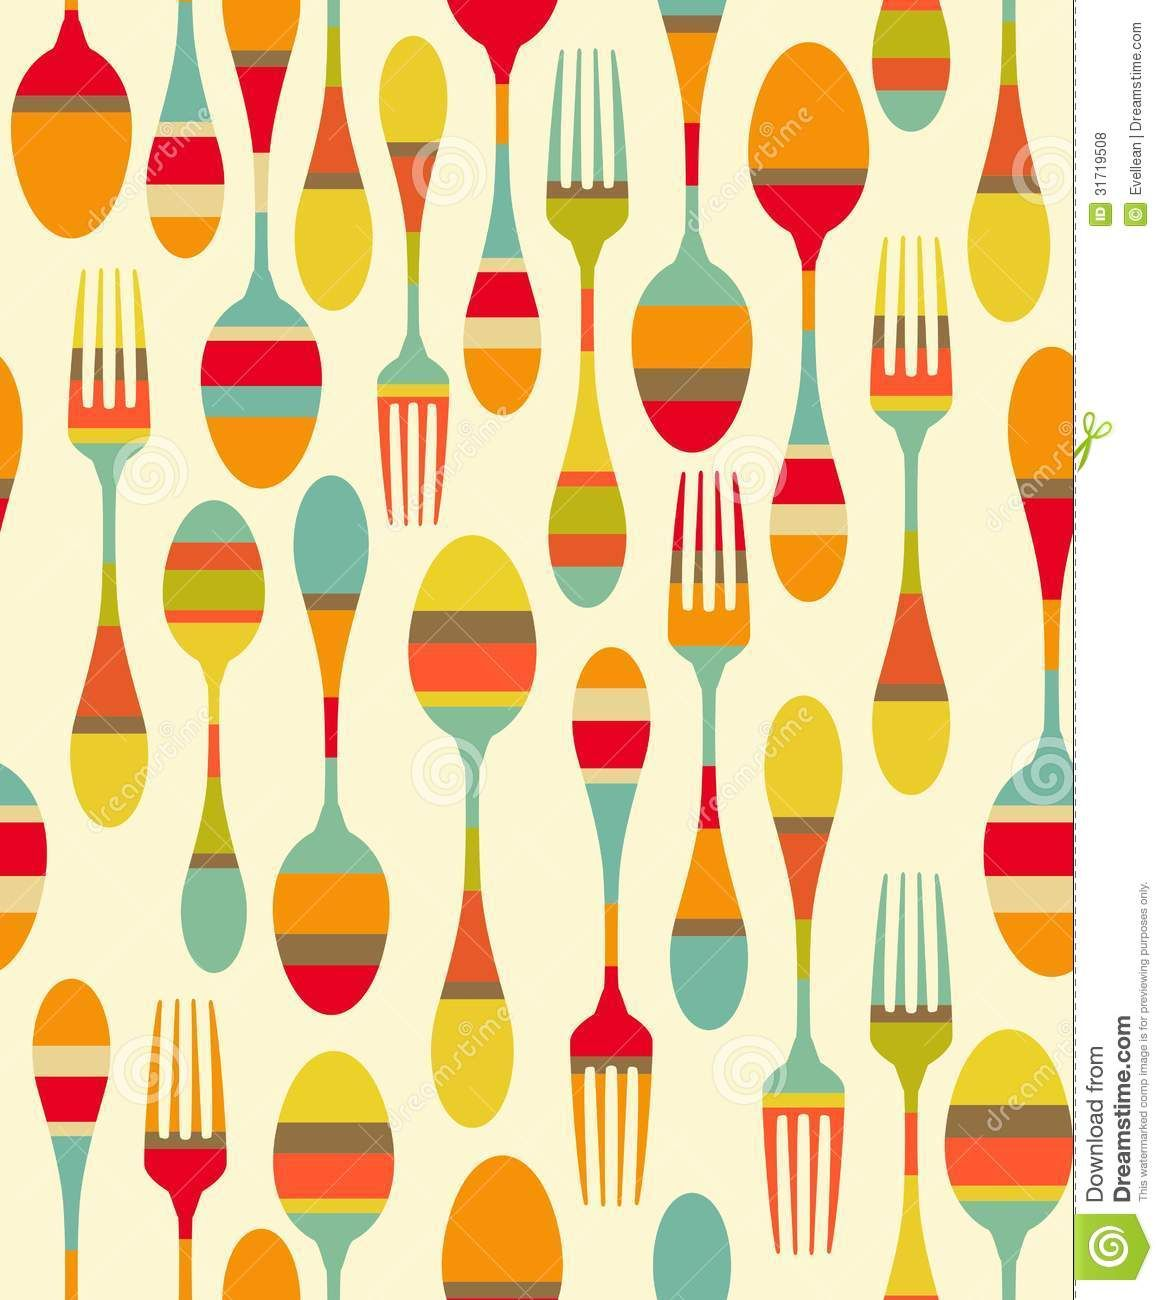 Vintage kitchen wallpaper patterns - Wallpaper Kitchen Retro Google Haku